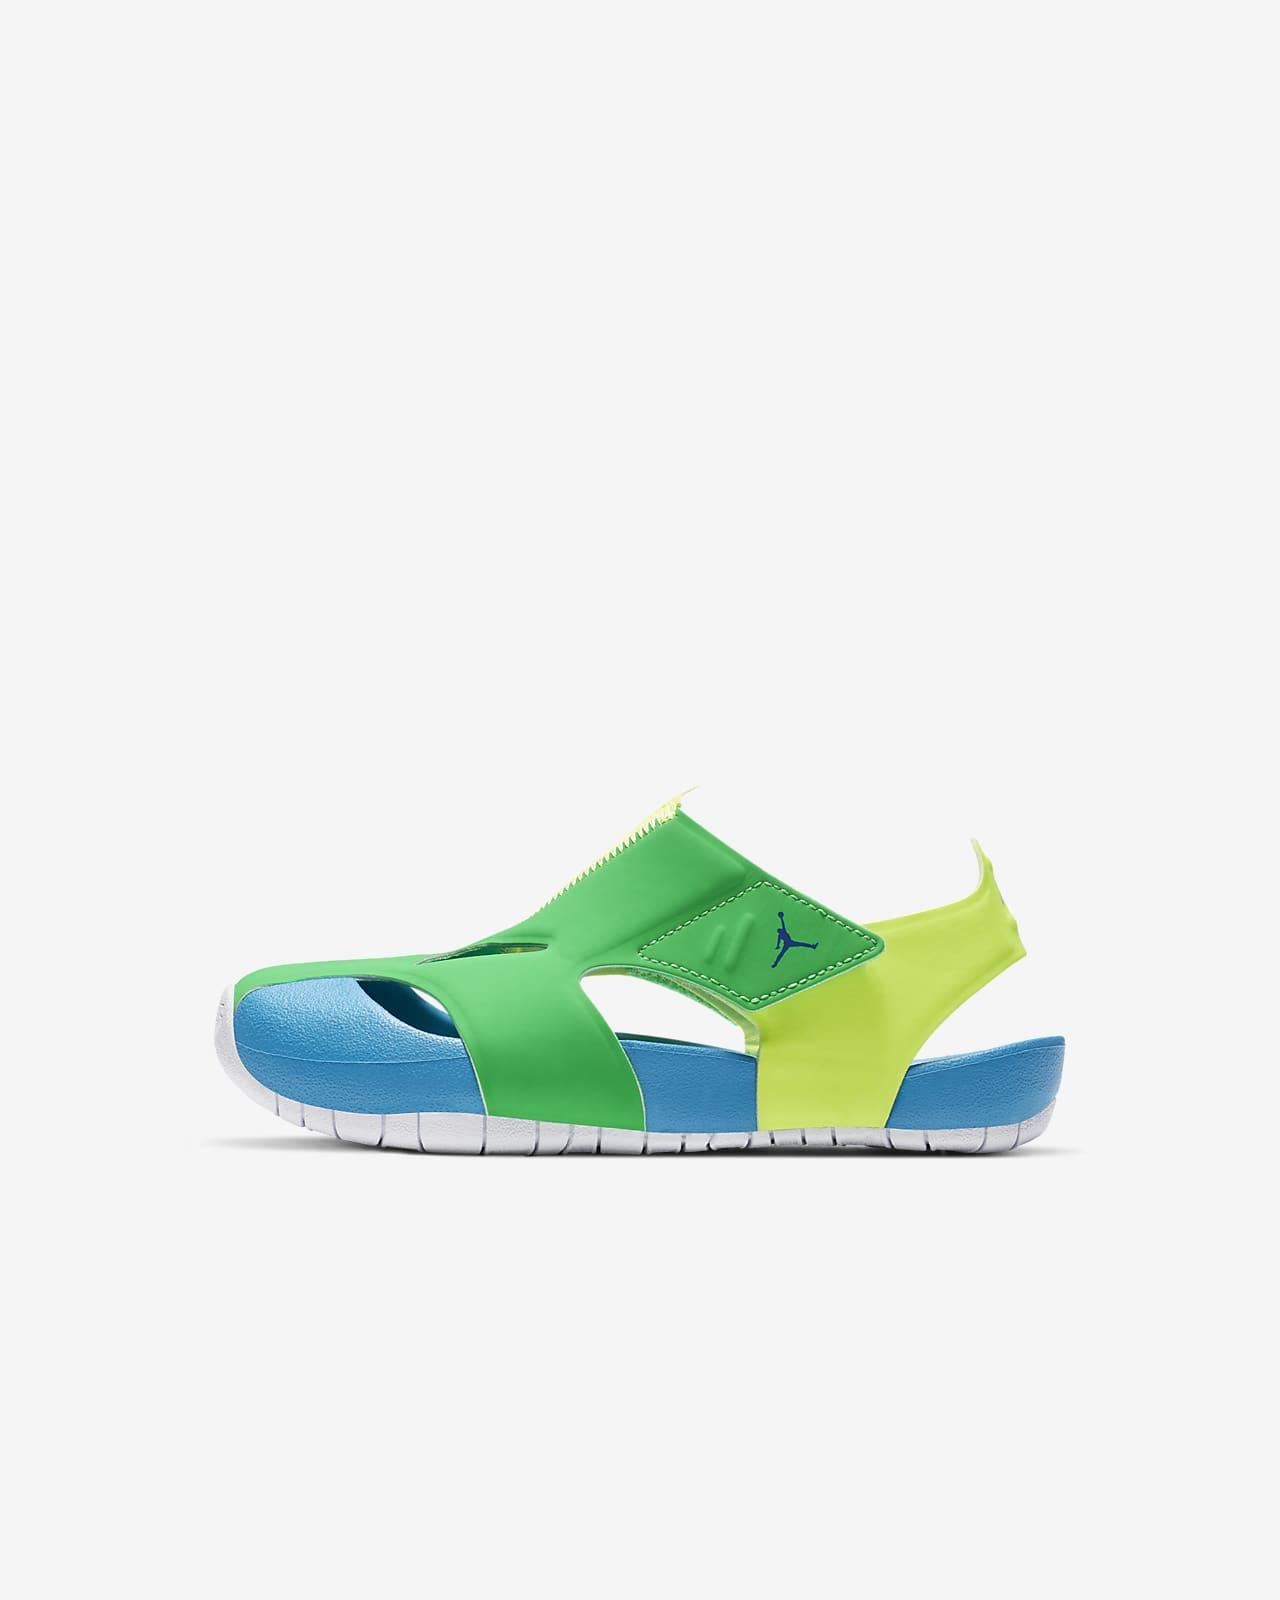 Jordan Flare Schuh für jüngere Kinder